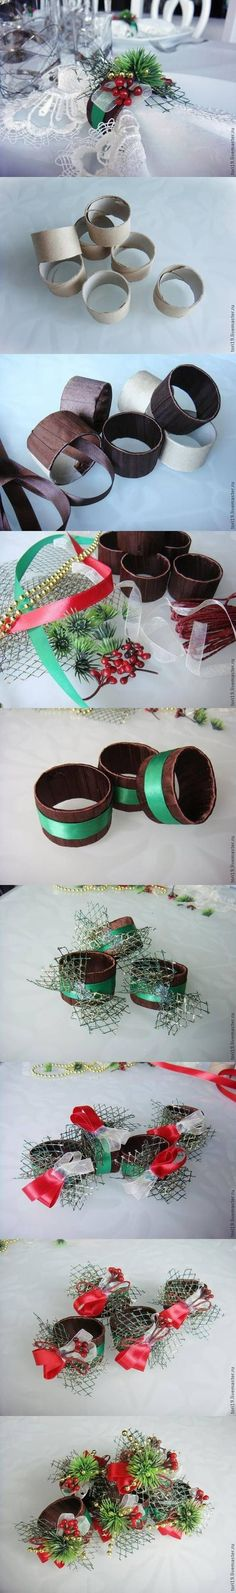 DIY Toilet Paper Roll Decorative Napkin Rings | iCreativeIdeas.com Like Us on Facebook ==> https://www.facebook.com/icreativeideas